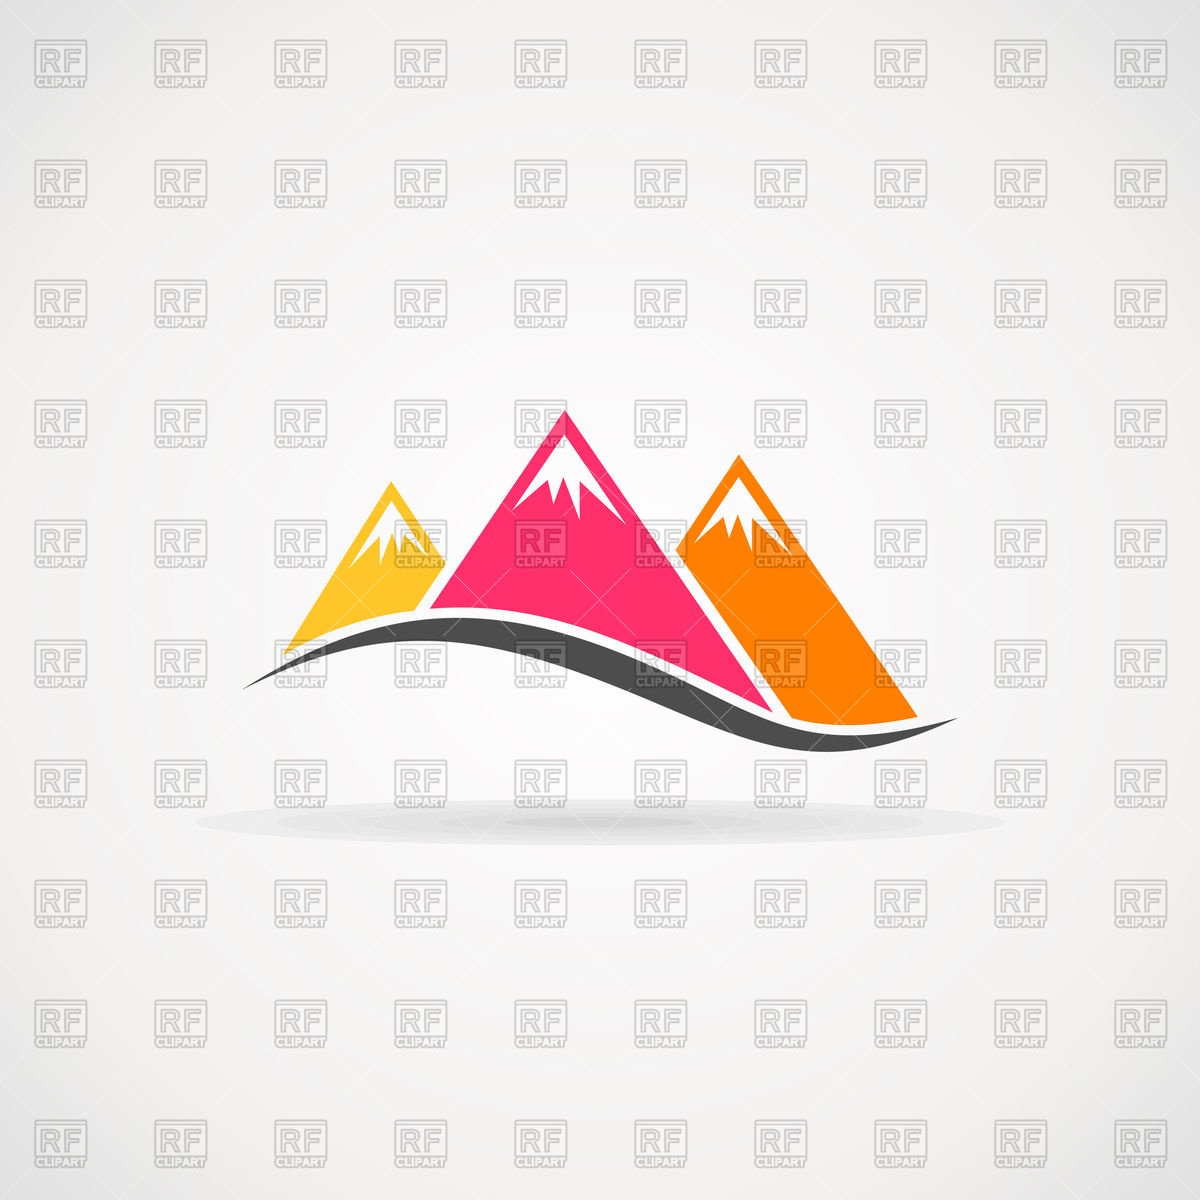 Three mountains icon Vector Image #95566.